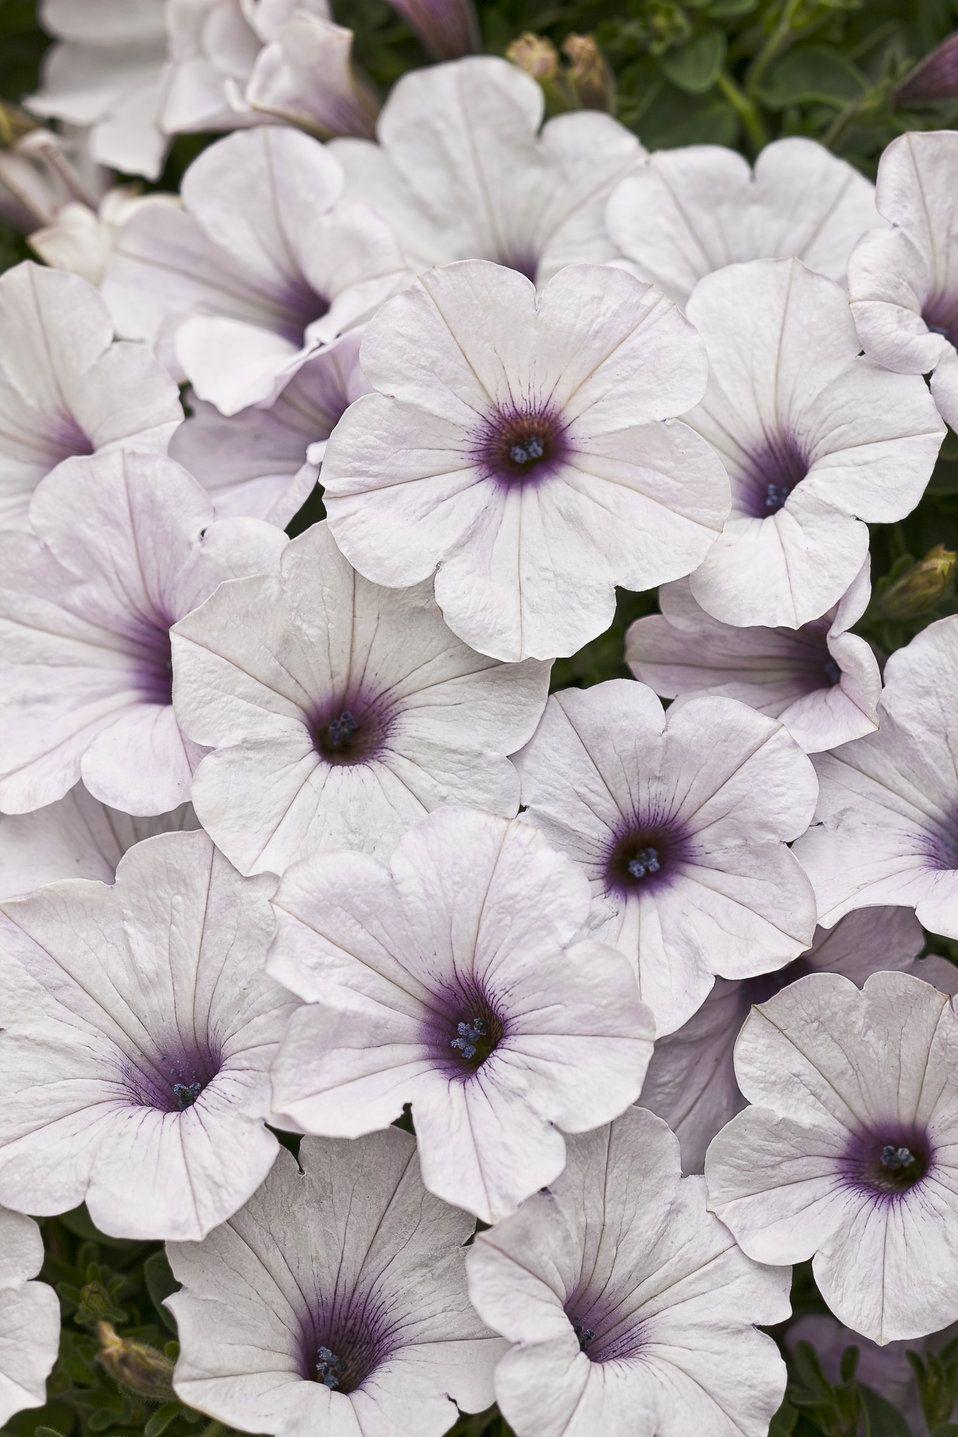 Supertunia Trailing Silver Petunia Hybrid Petunia Flower